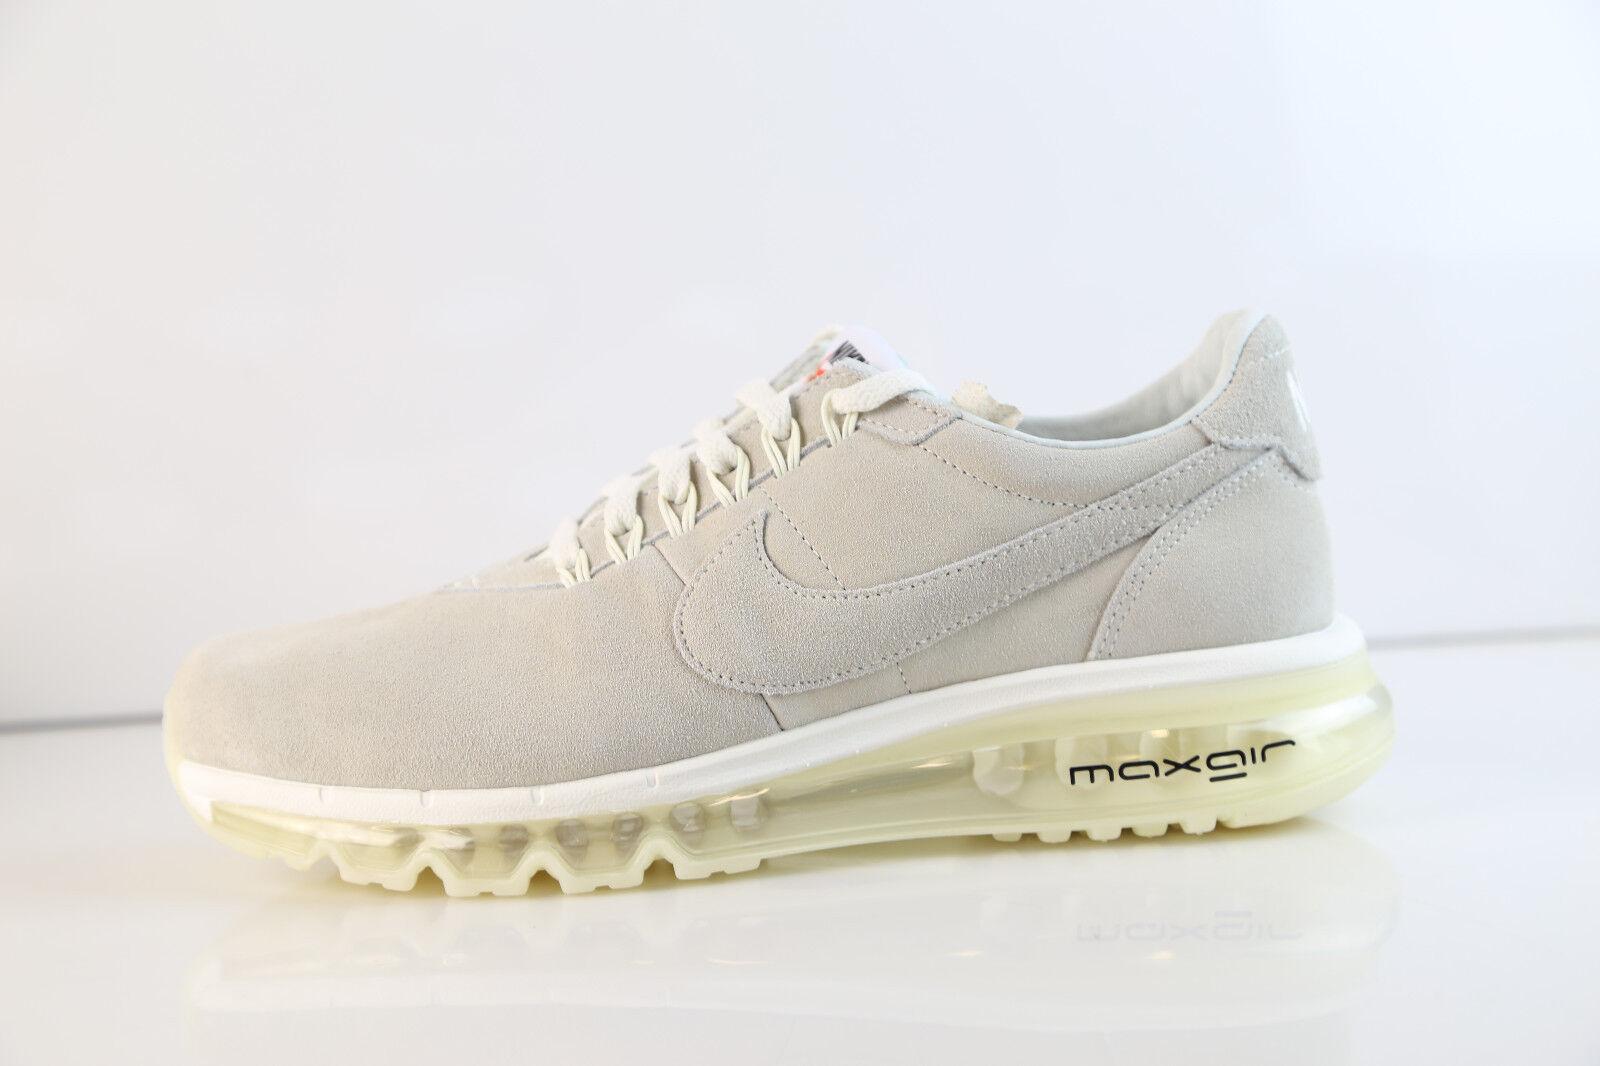 aacd9e0bec Air Max LD-Zero Sail Black 9.5 suede Nike 848624-100 noeijx10047-Athletic  Shoes